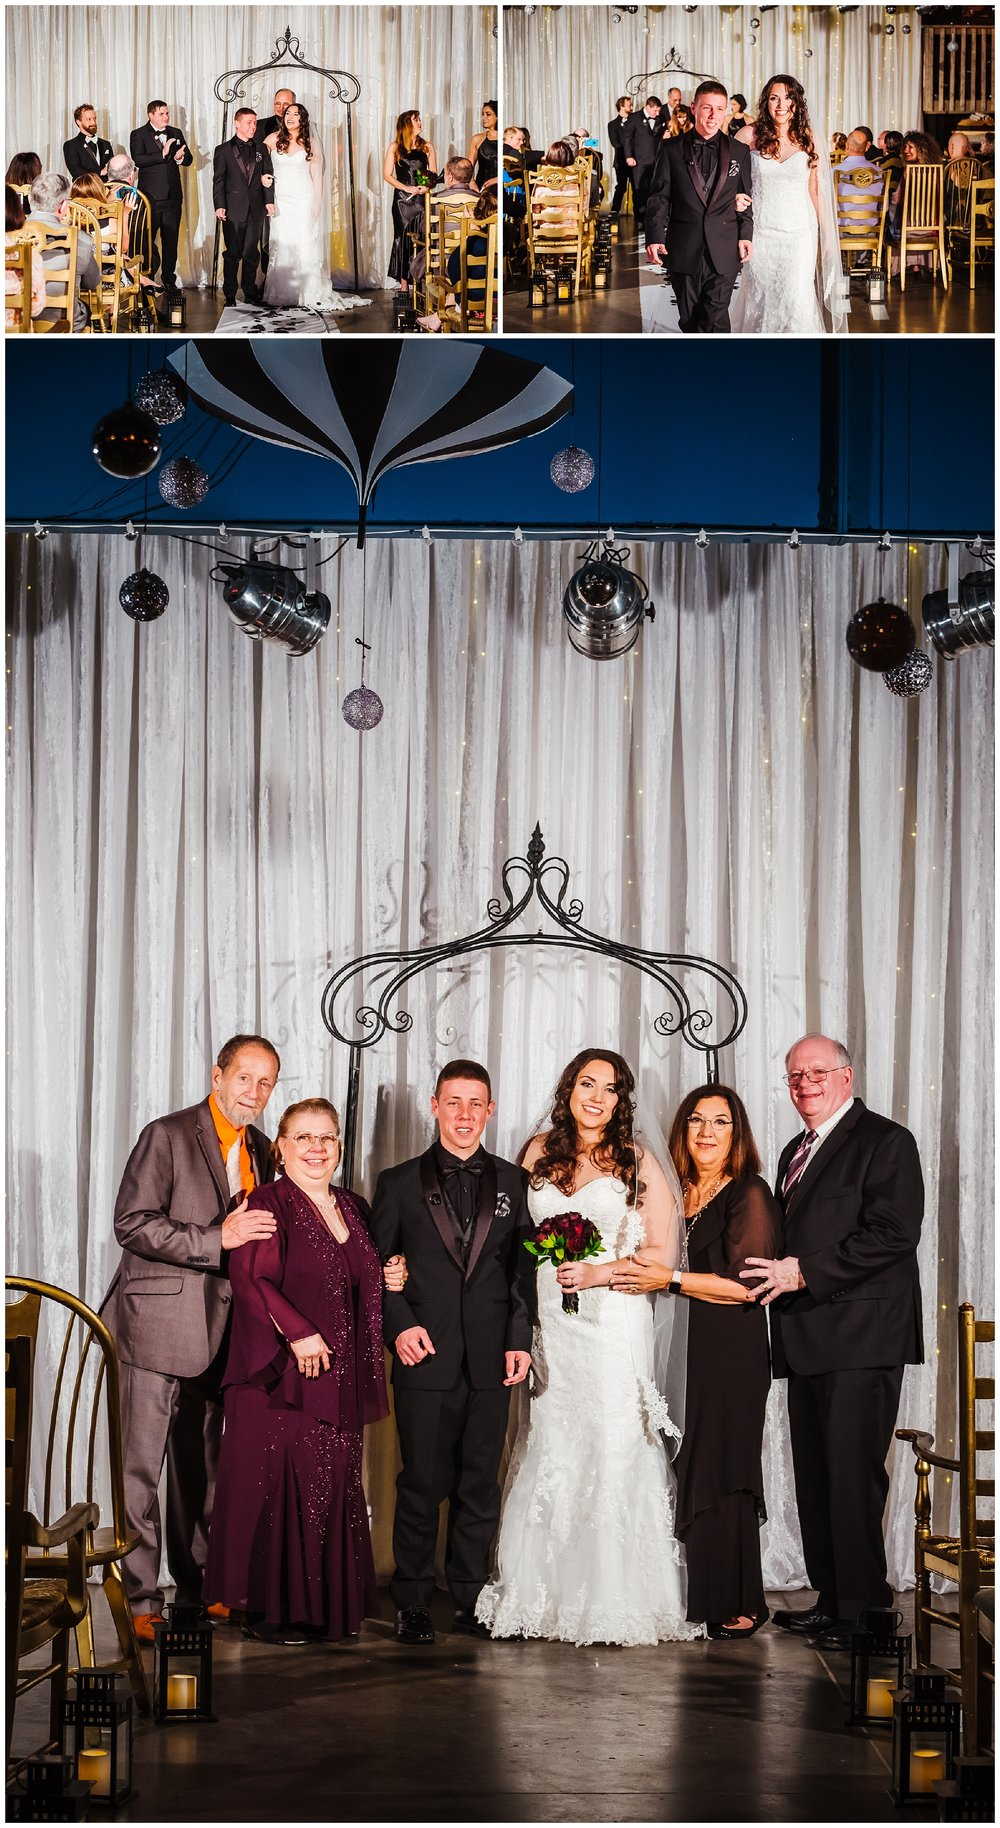 tampa-wedding-photographer-unique-indoor-venue_0028.jpg